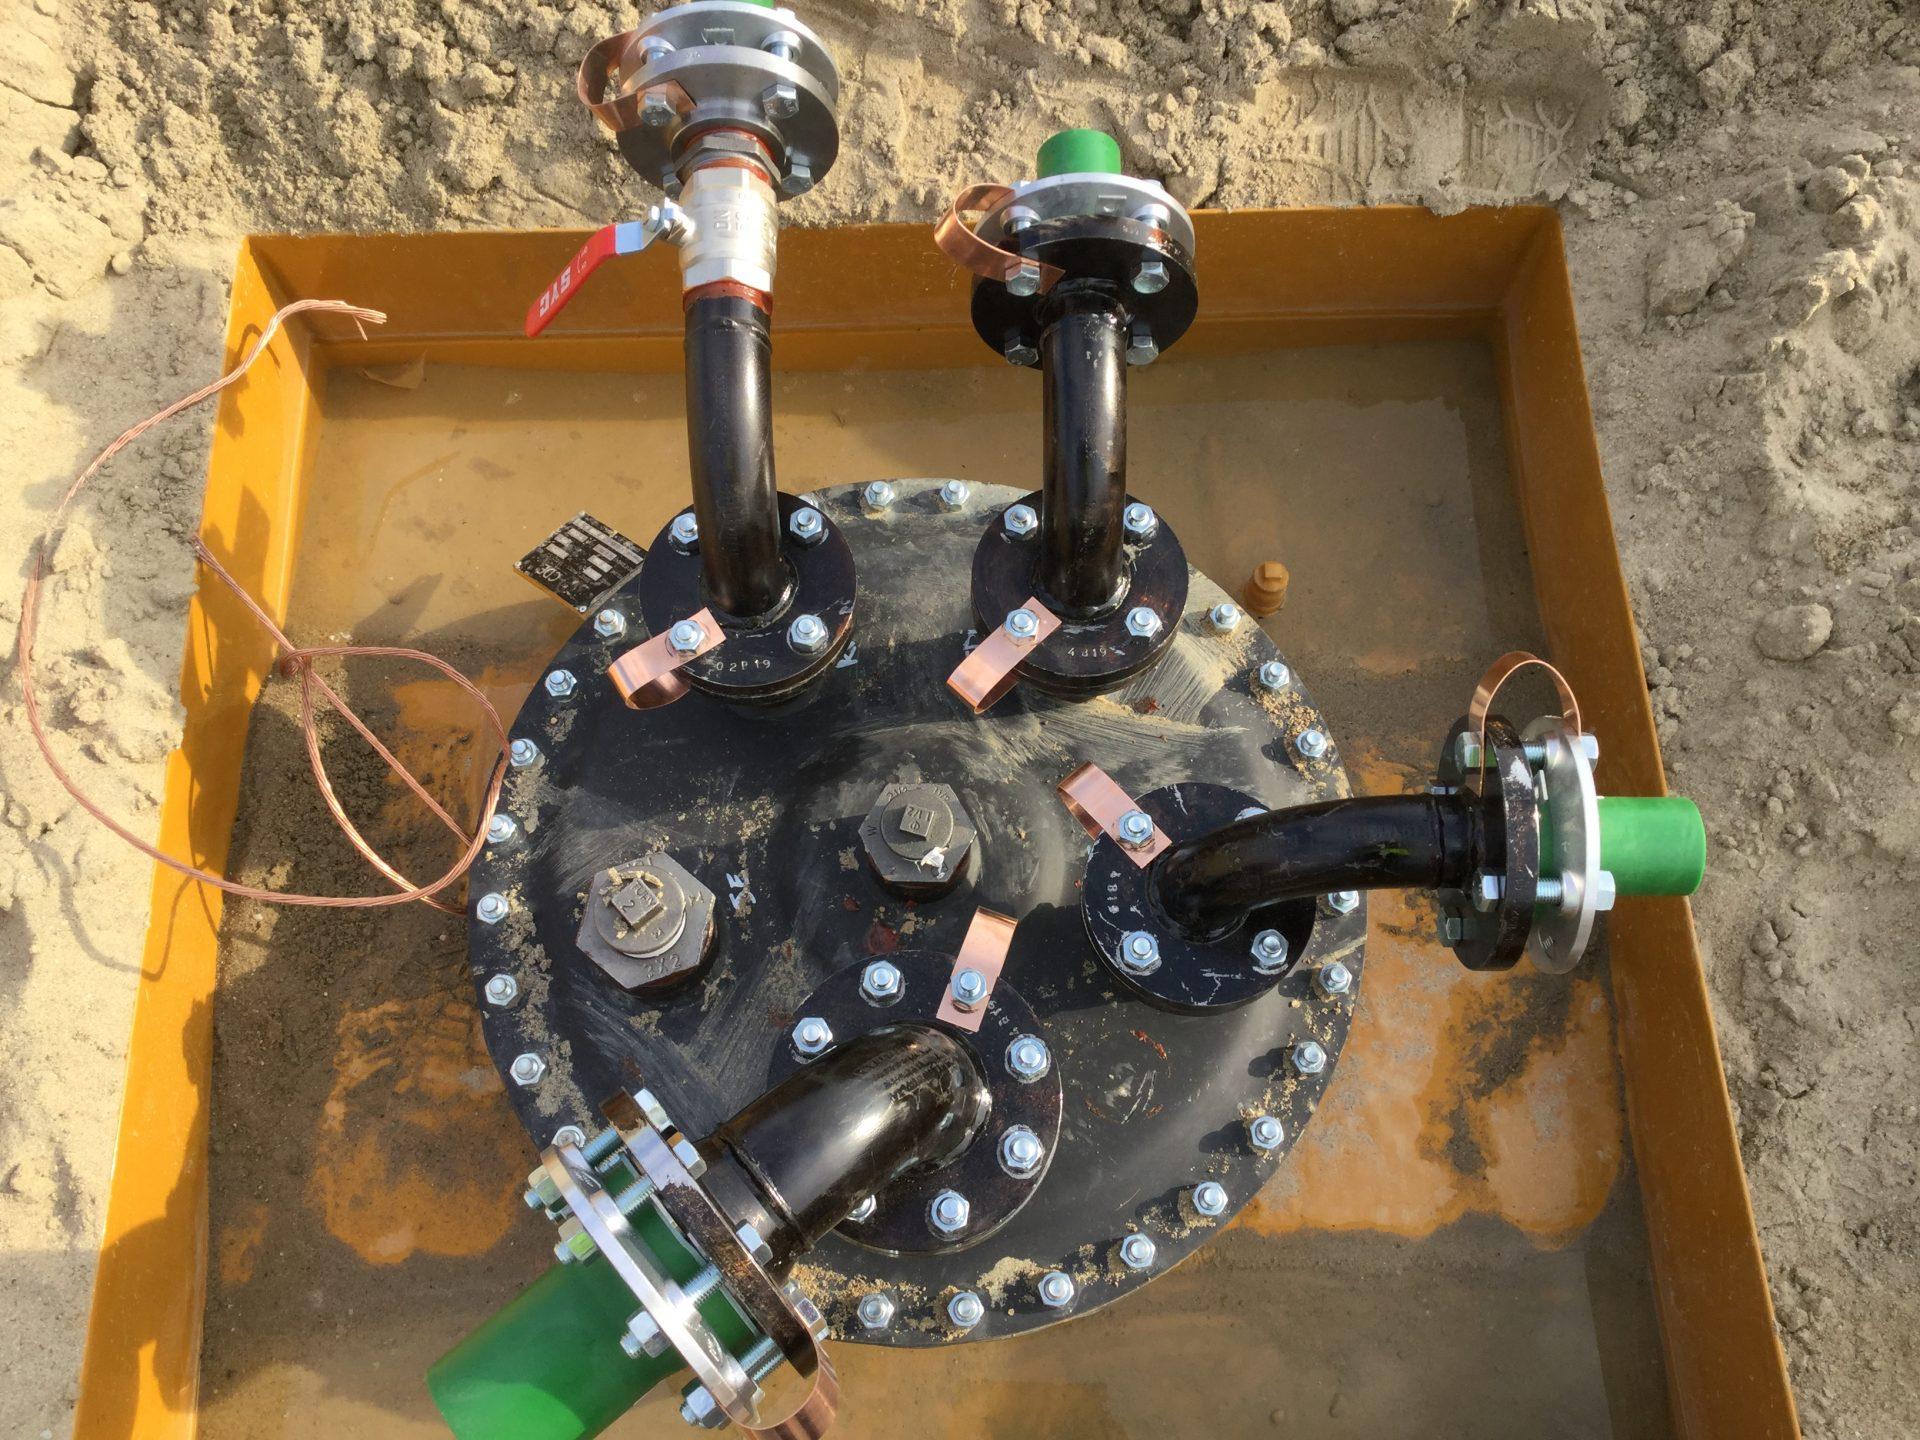 Future station de carburant : installation de la grosse cuve